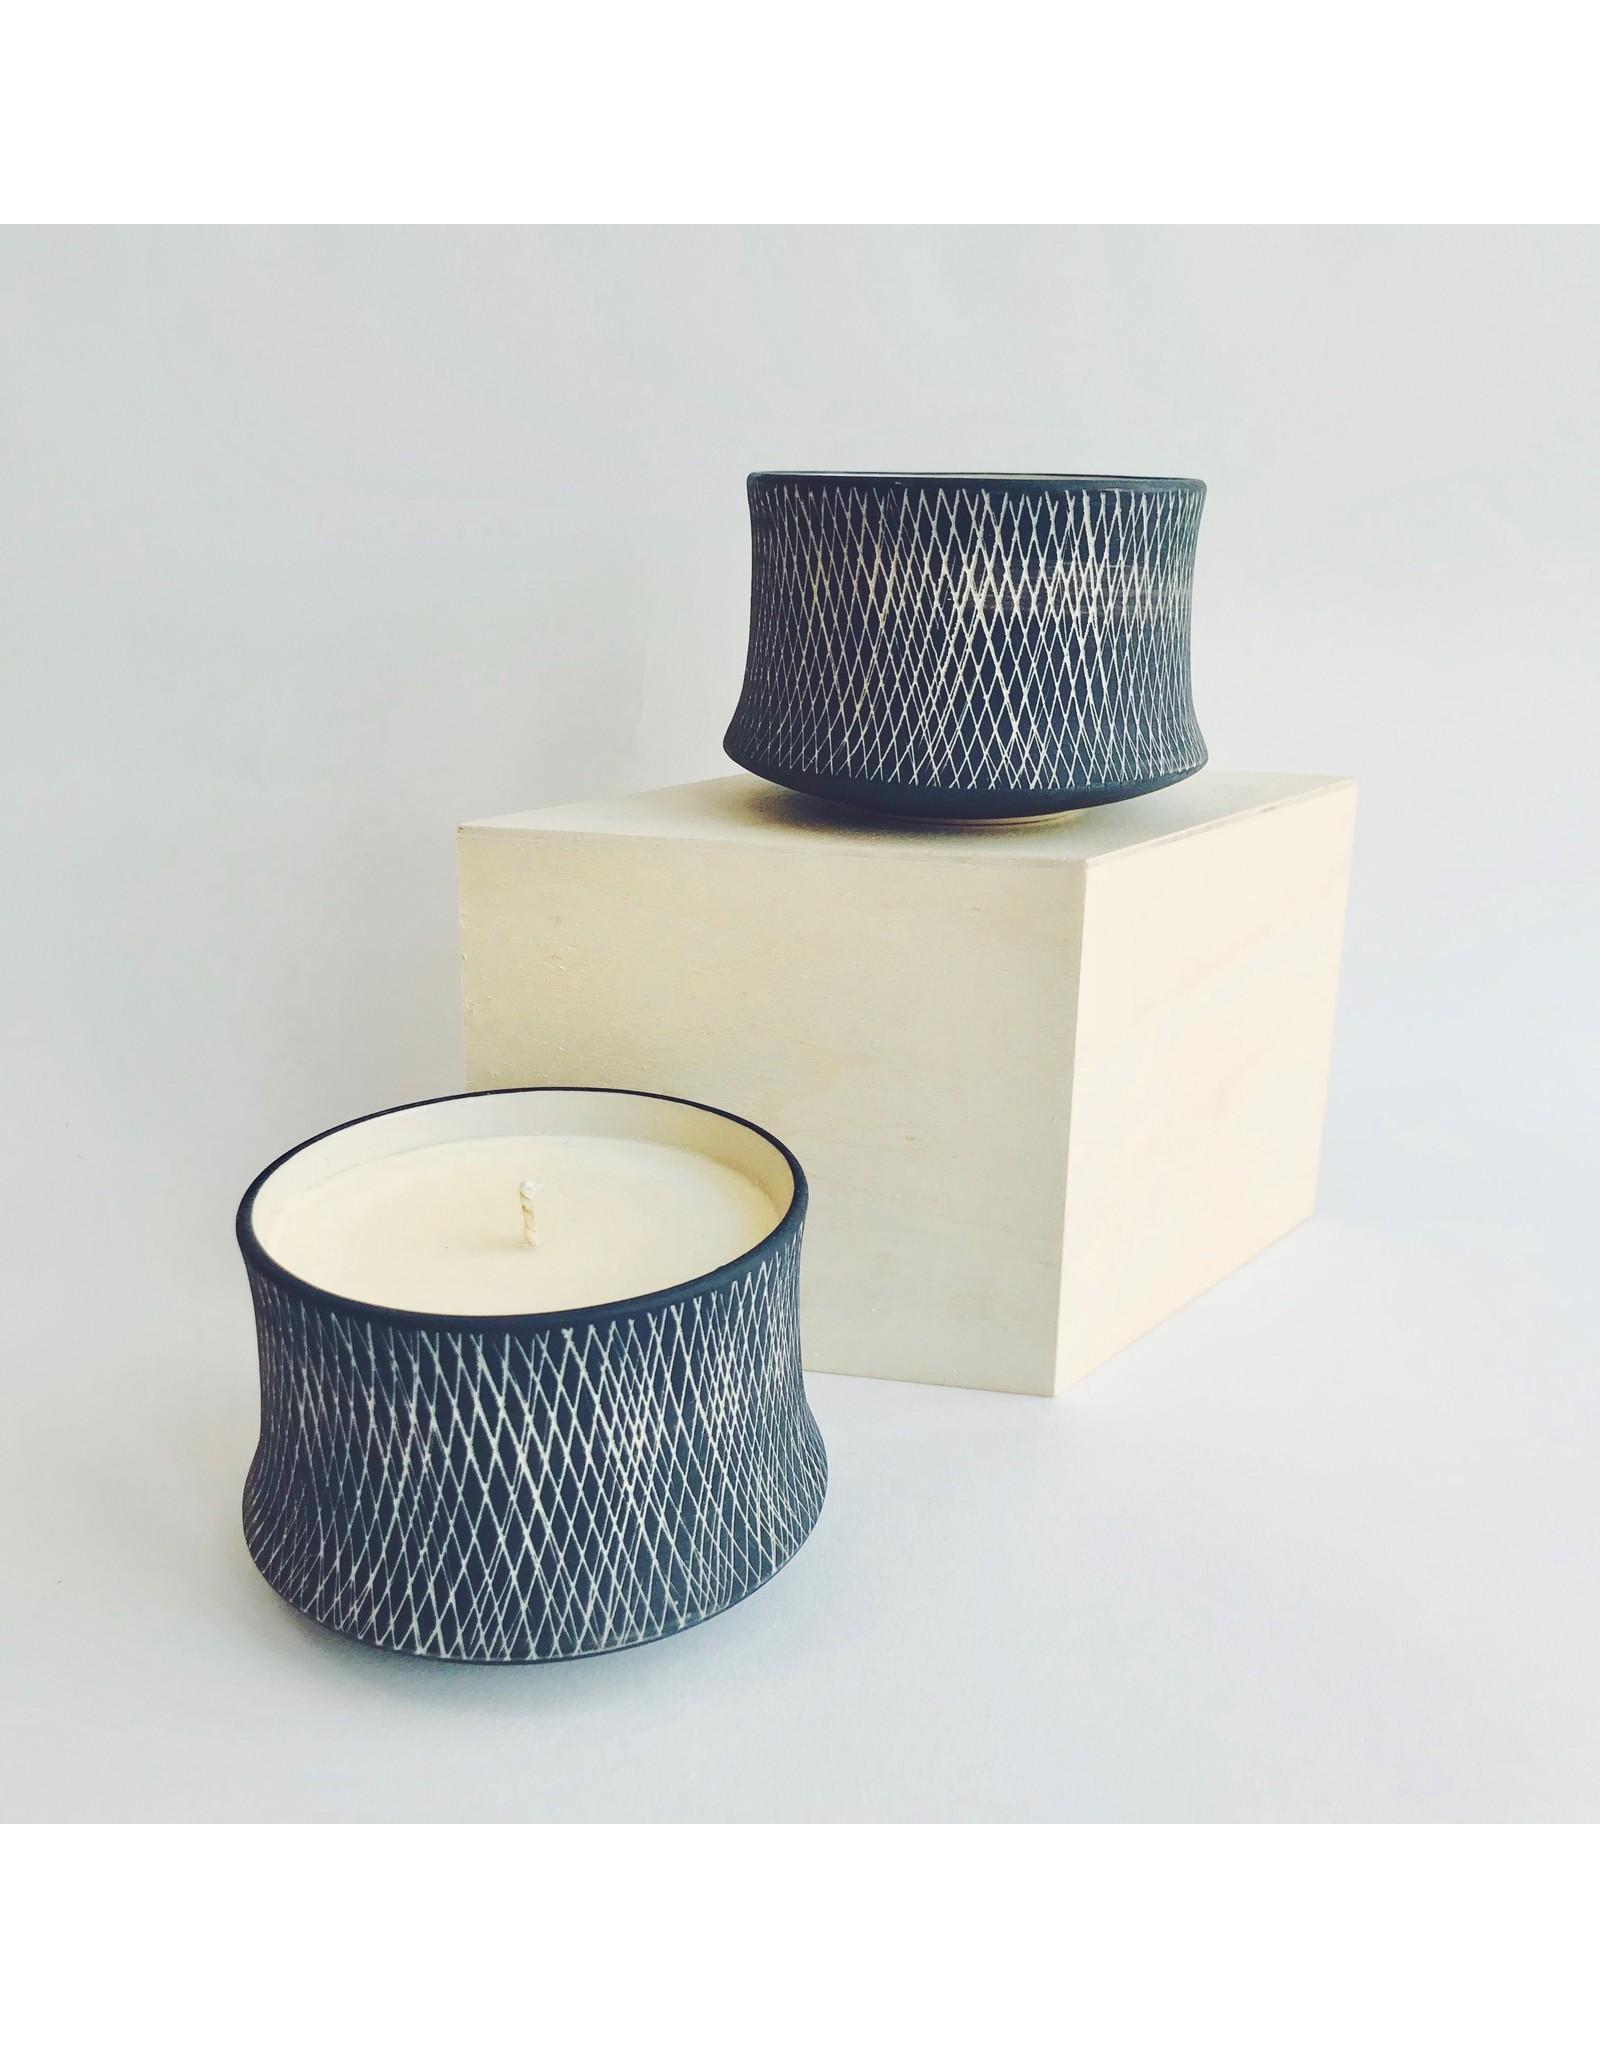 Scented Candle in a Ceramic Pot